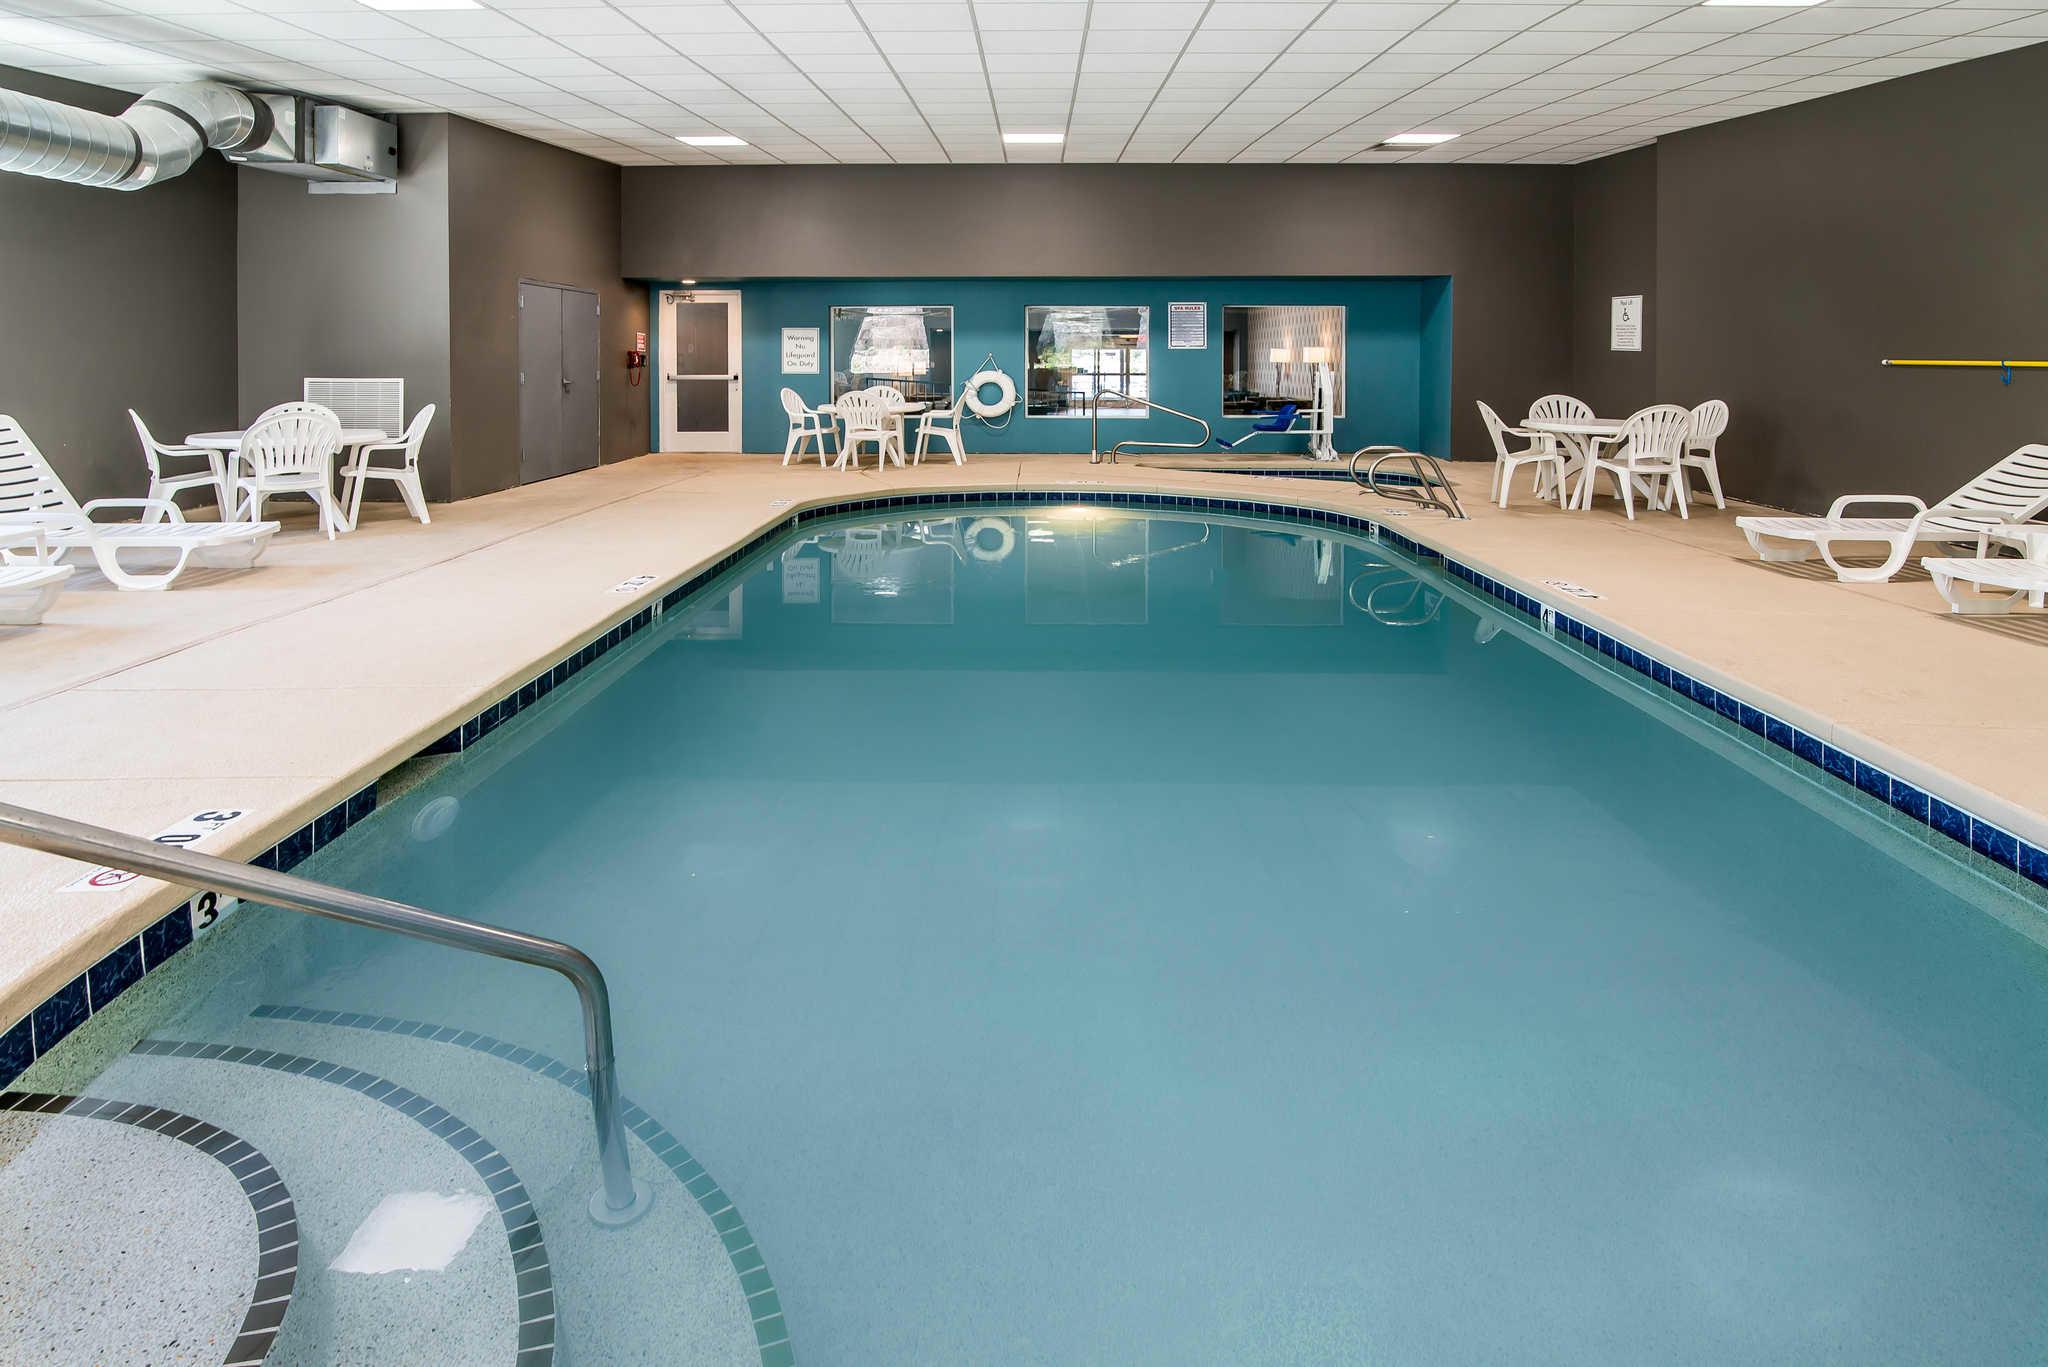 Quality Inn & Suites - Ruidoso Hwy 70 image 26